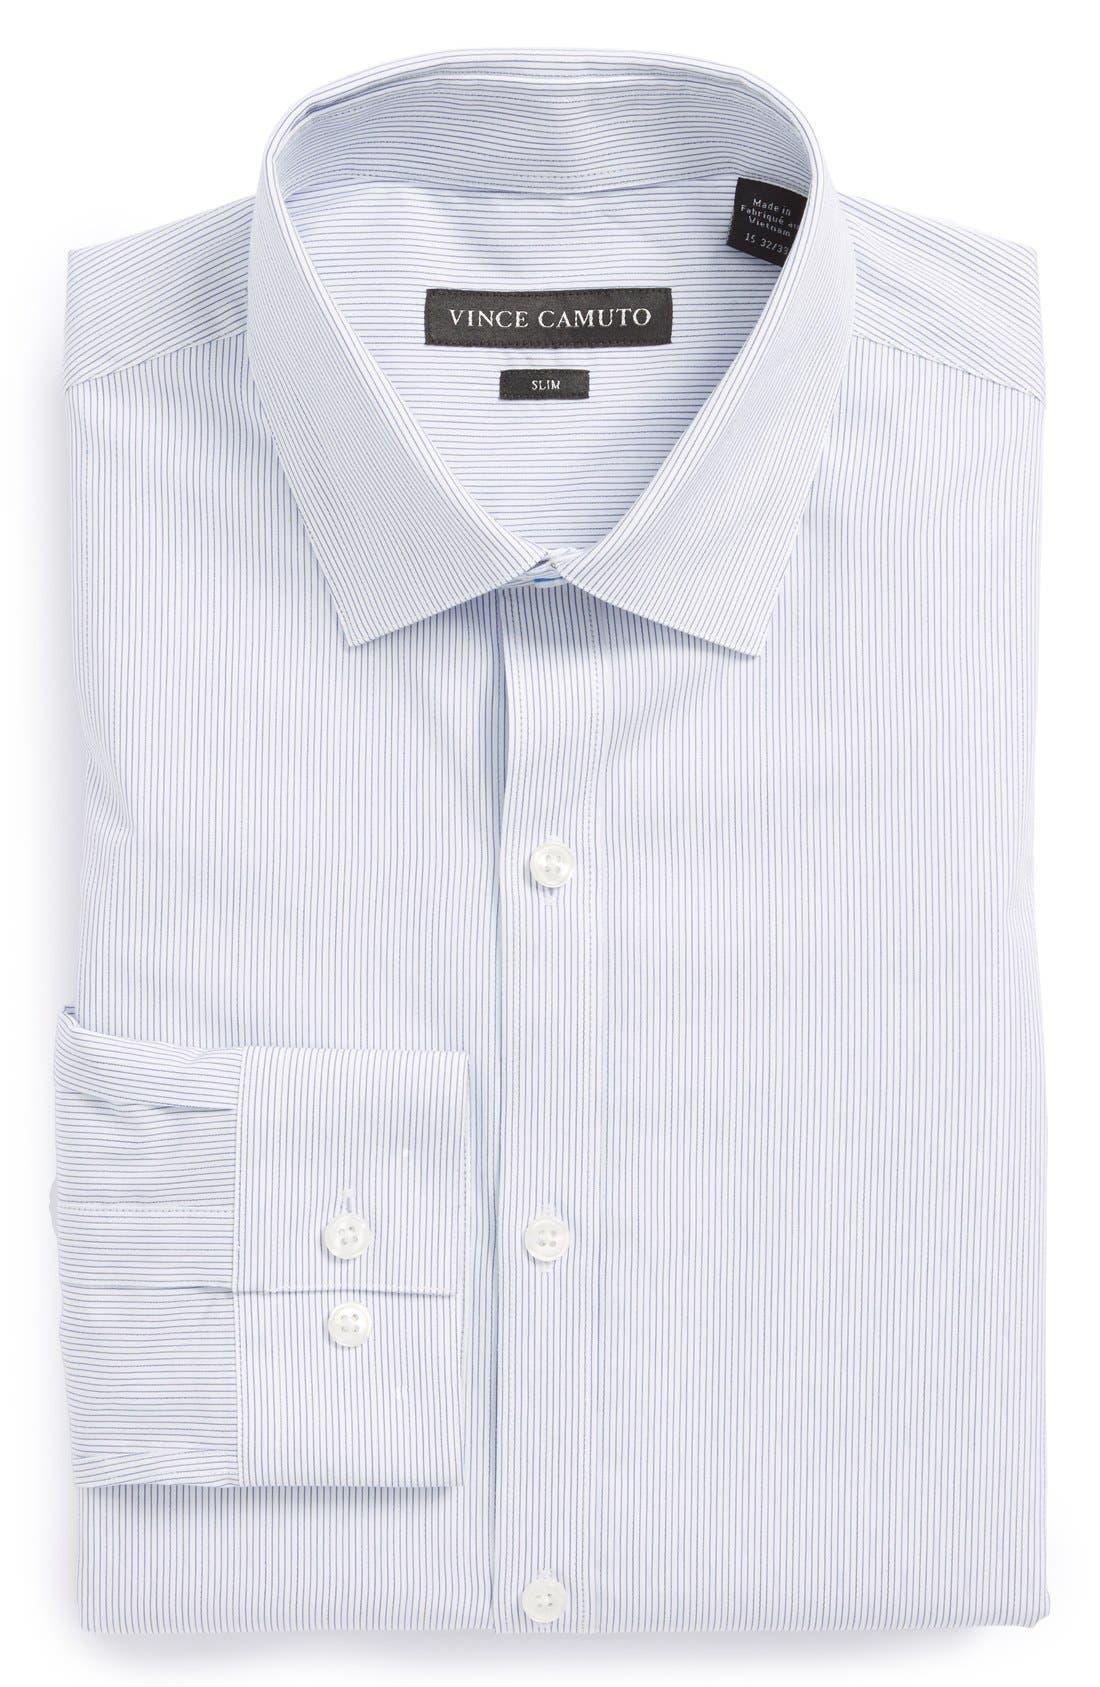 Main Image - Vince Camuto Slim Fit Stripe Dress Shirt